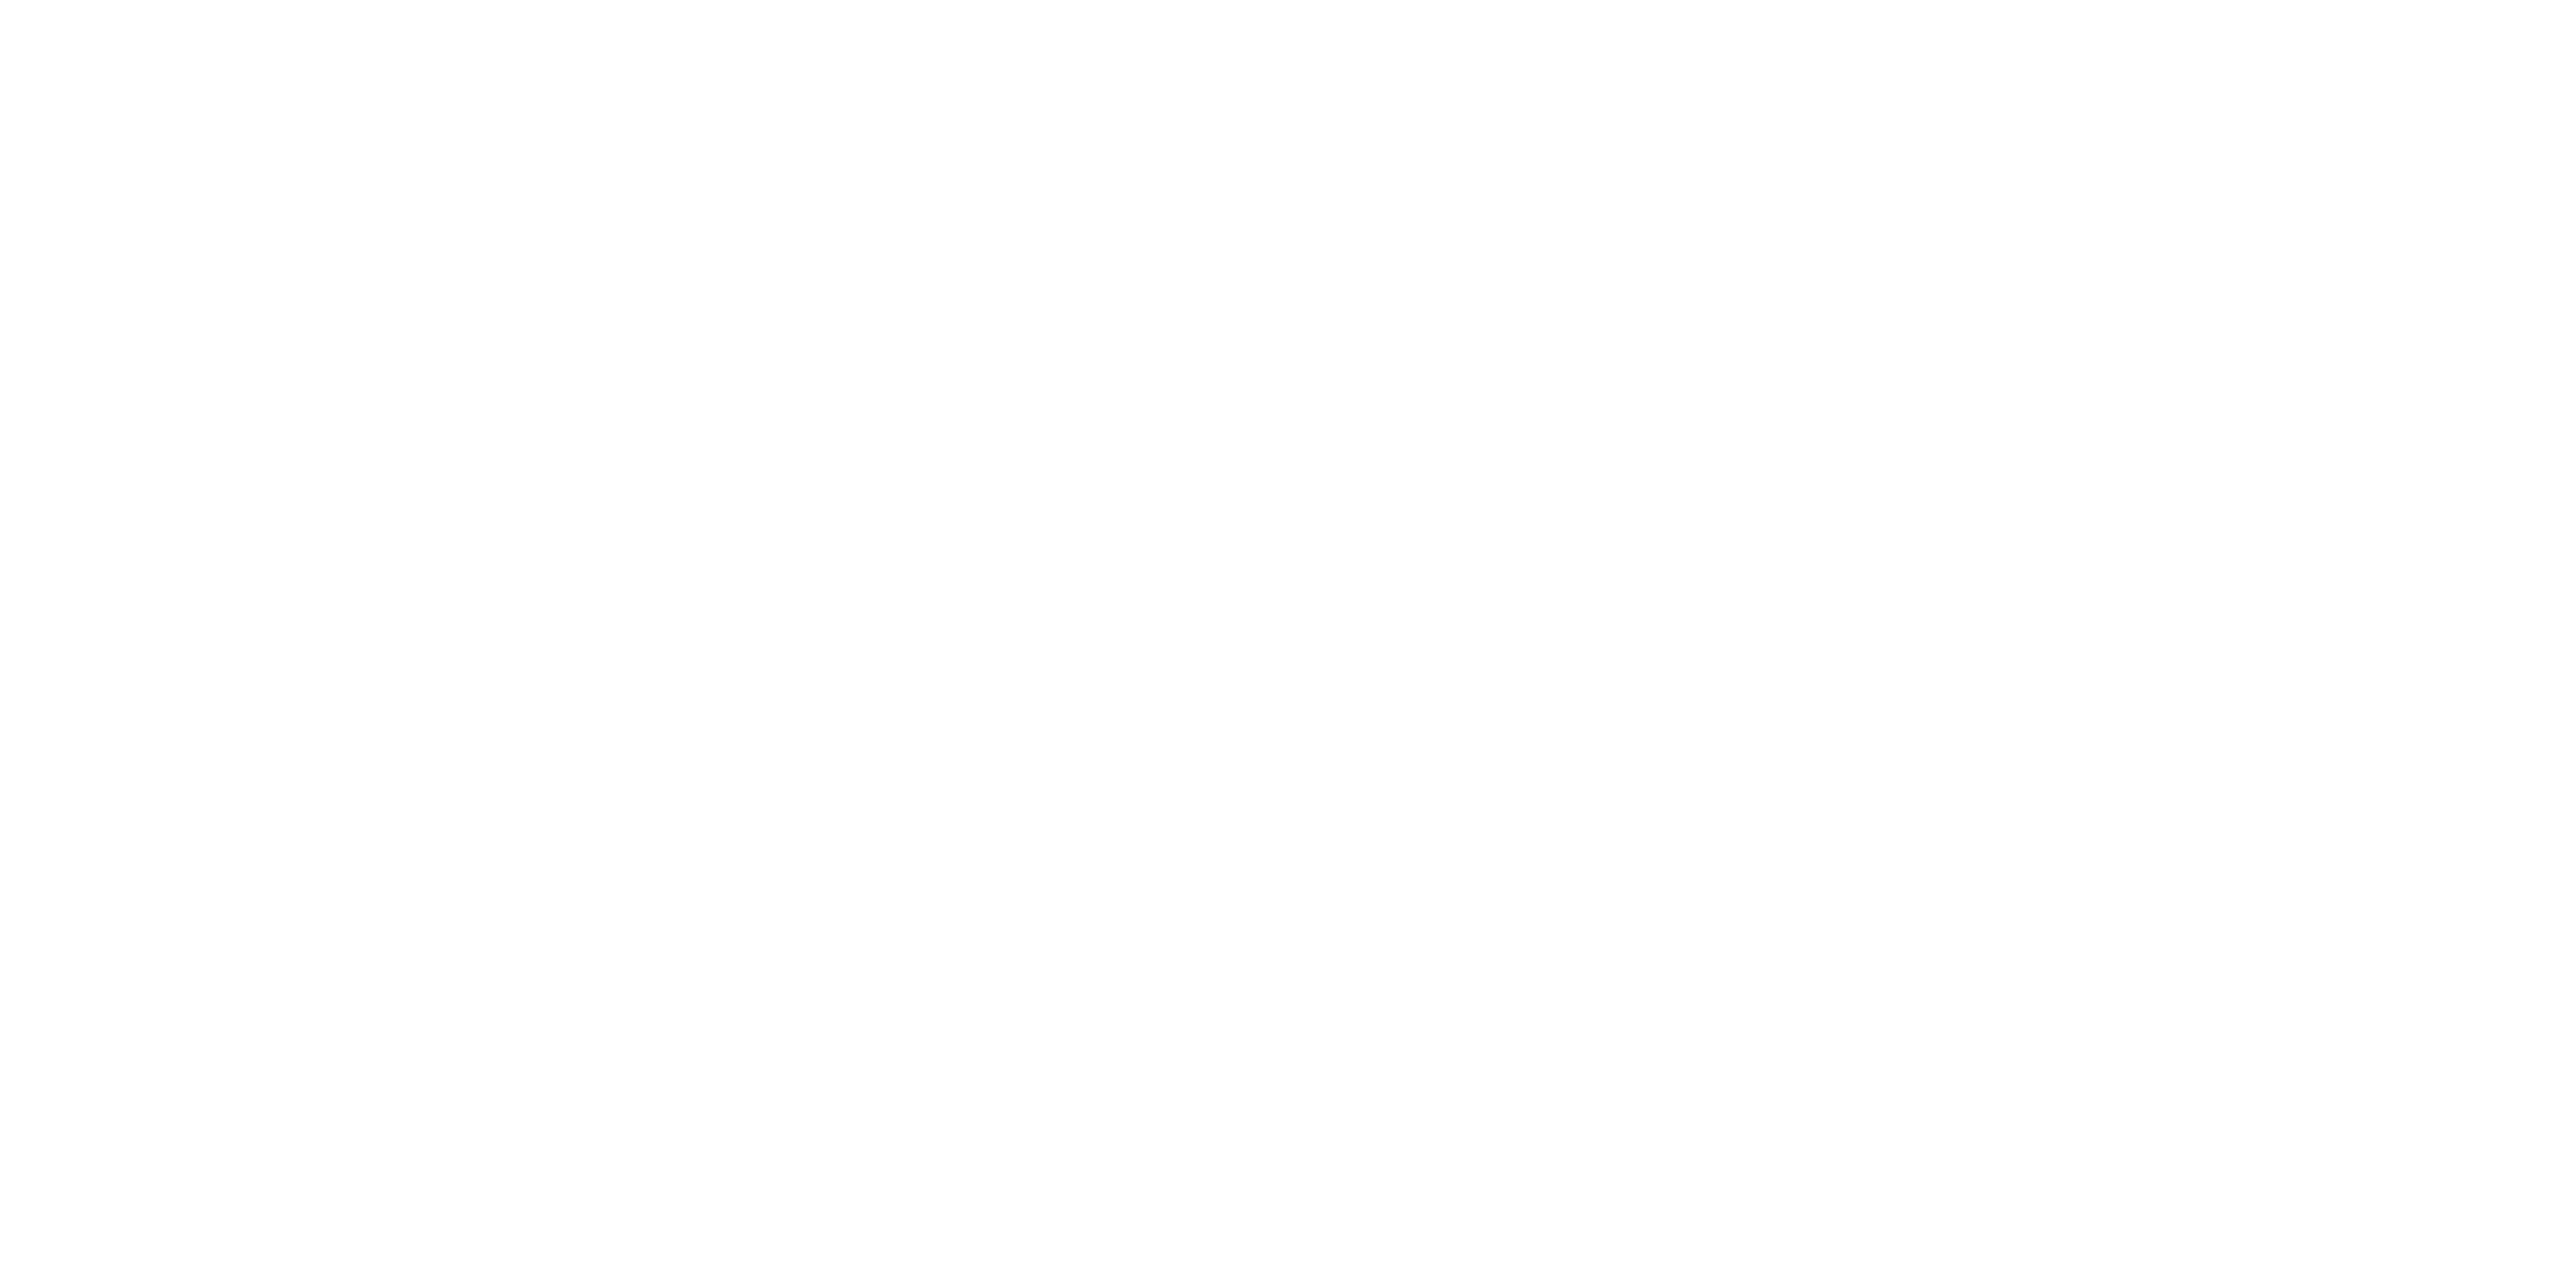 Logoscope